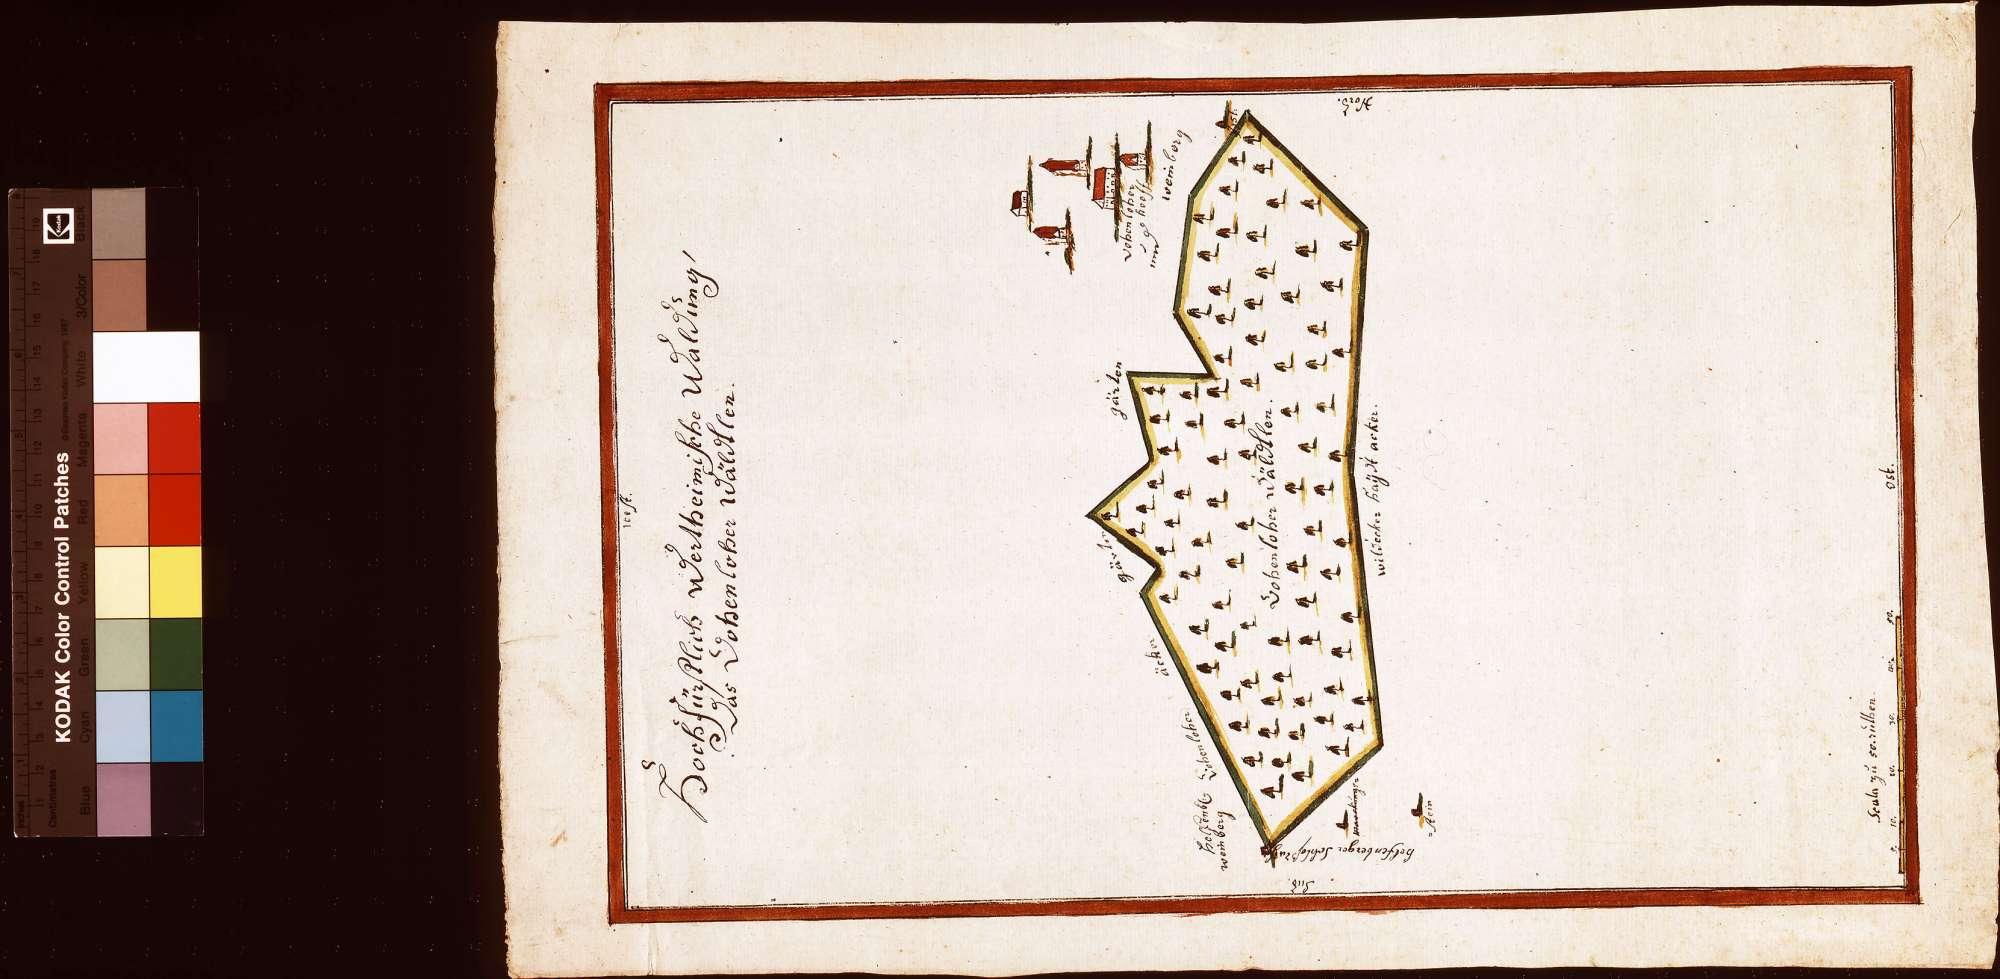 Vohenloher Wäldle (Inselkarte), Bild 1